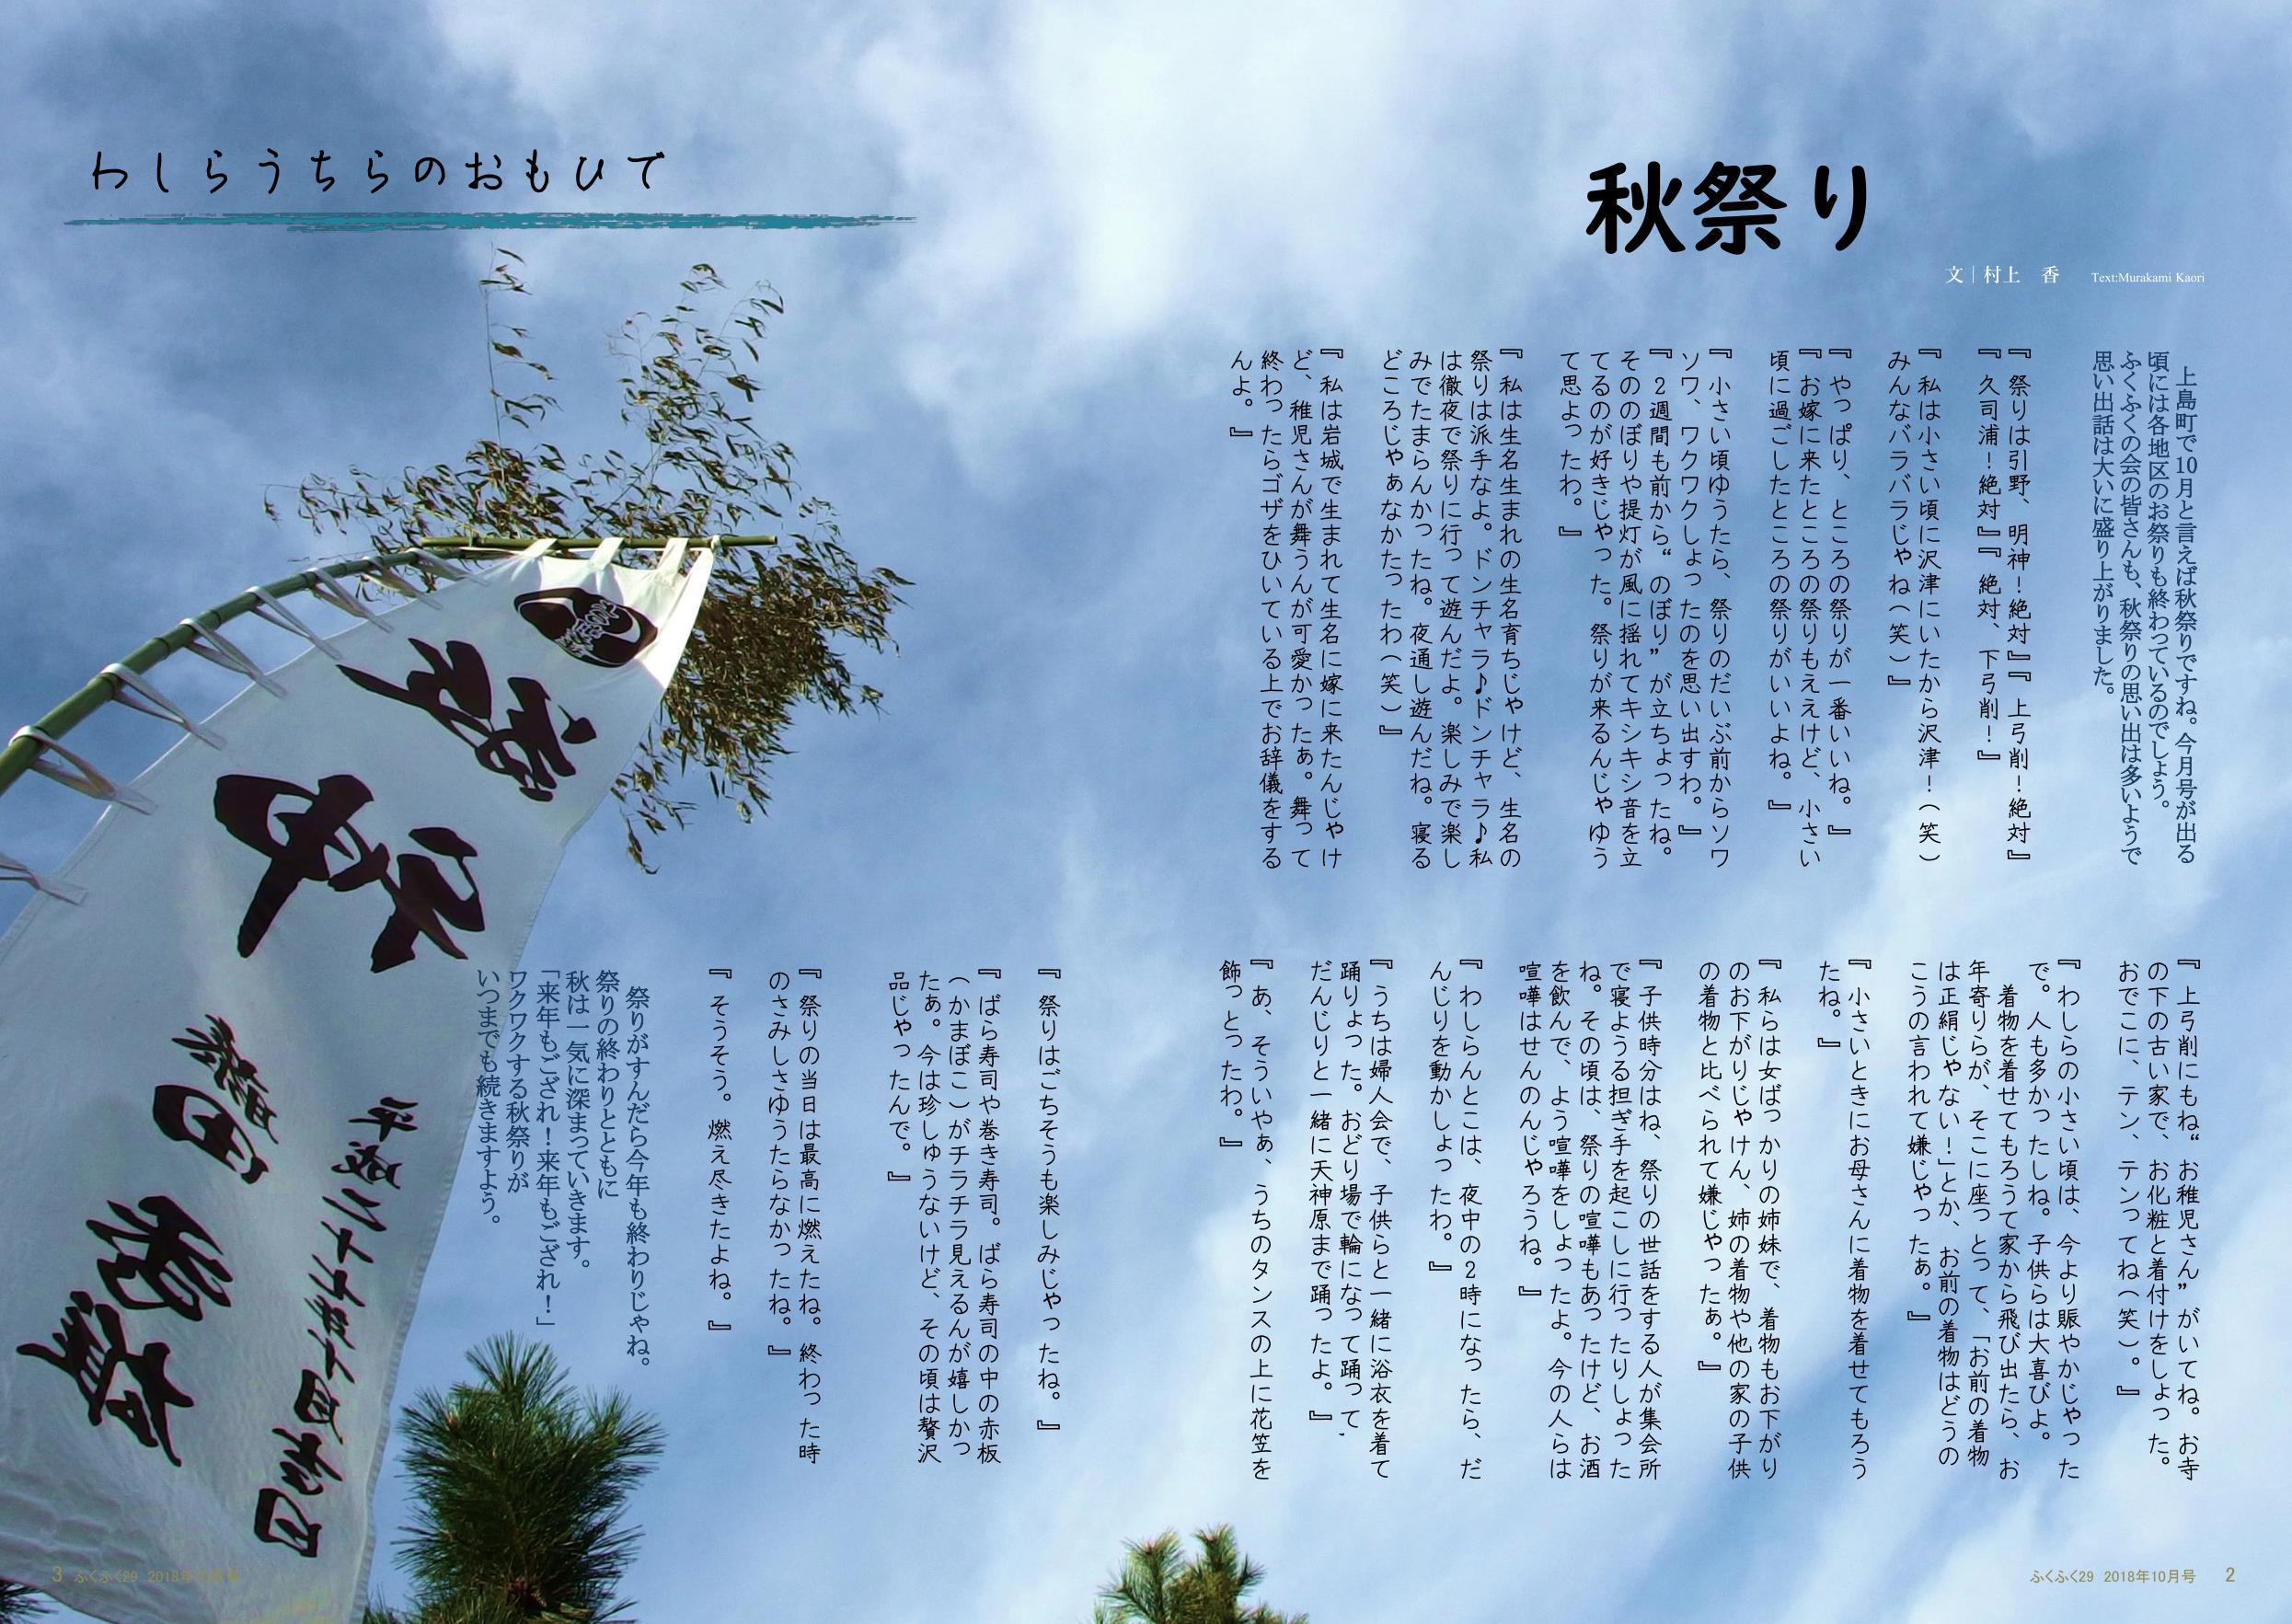 http://fukufukunokai.com/newsletter/images/%E5%85%A5%E7%A8%BF%E3%83%87%E3%83%BC%E3%82%BF_cropped_2.jpeg